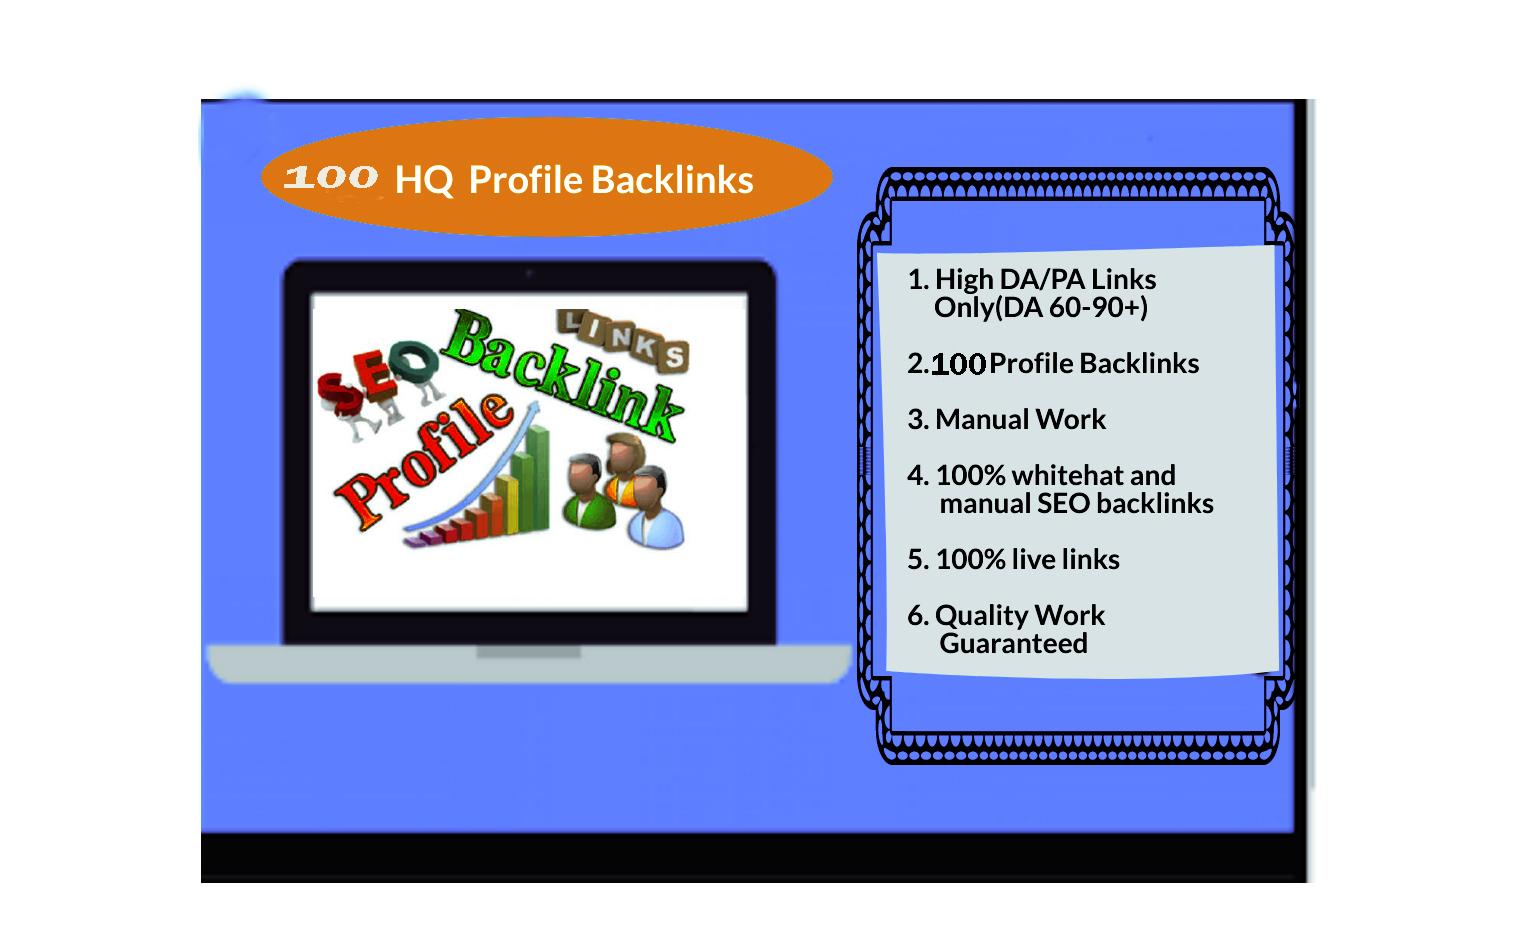 I Will Do Provide Manually 100 HQ Profile Backlinks for SEO